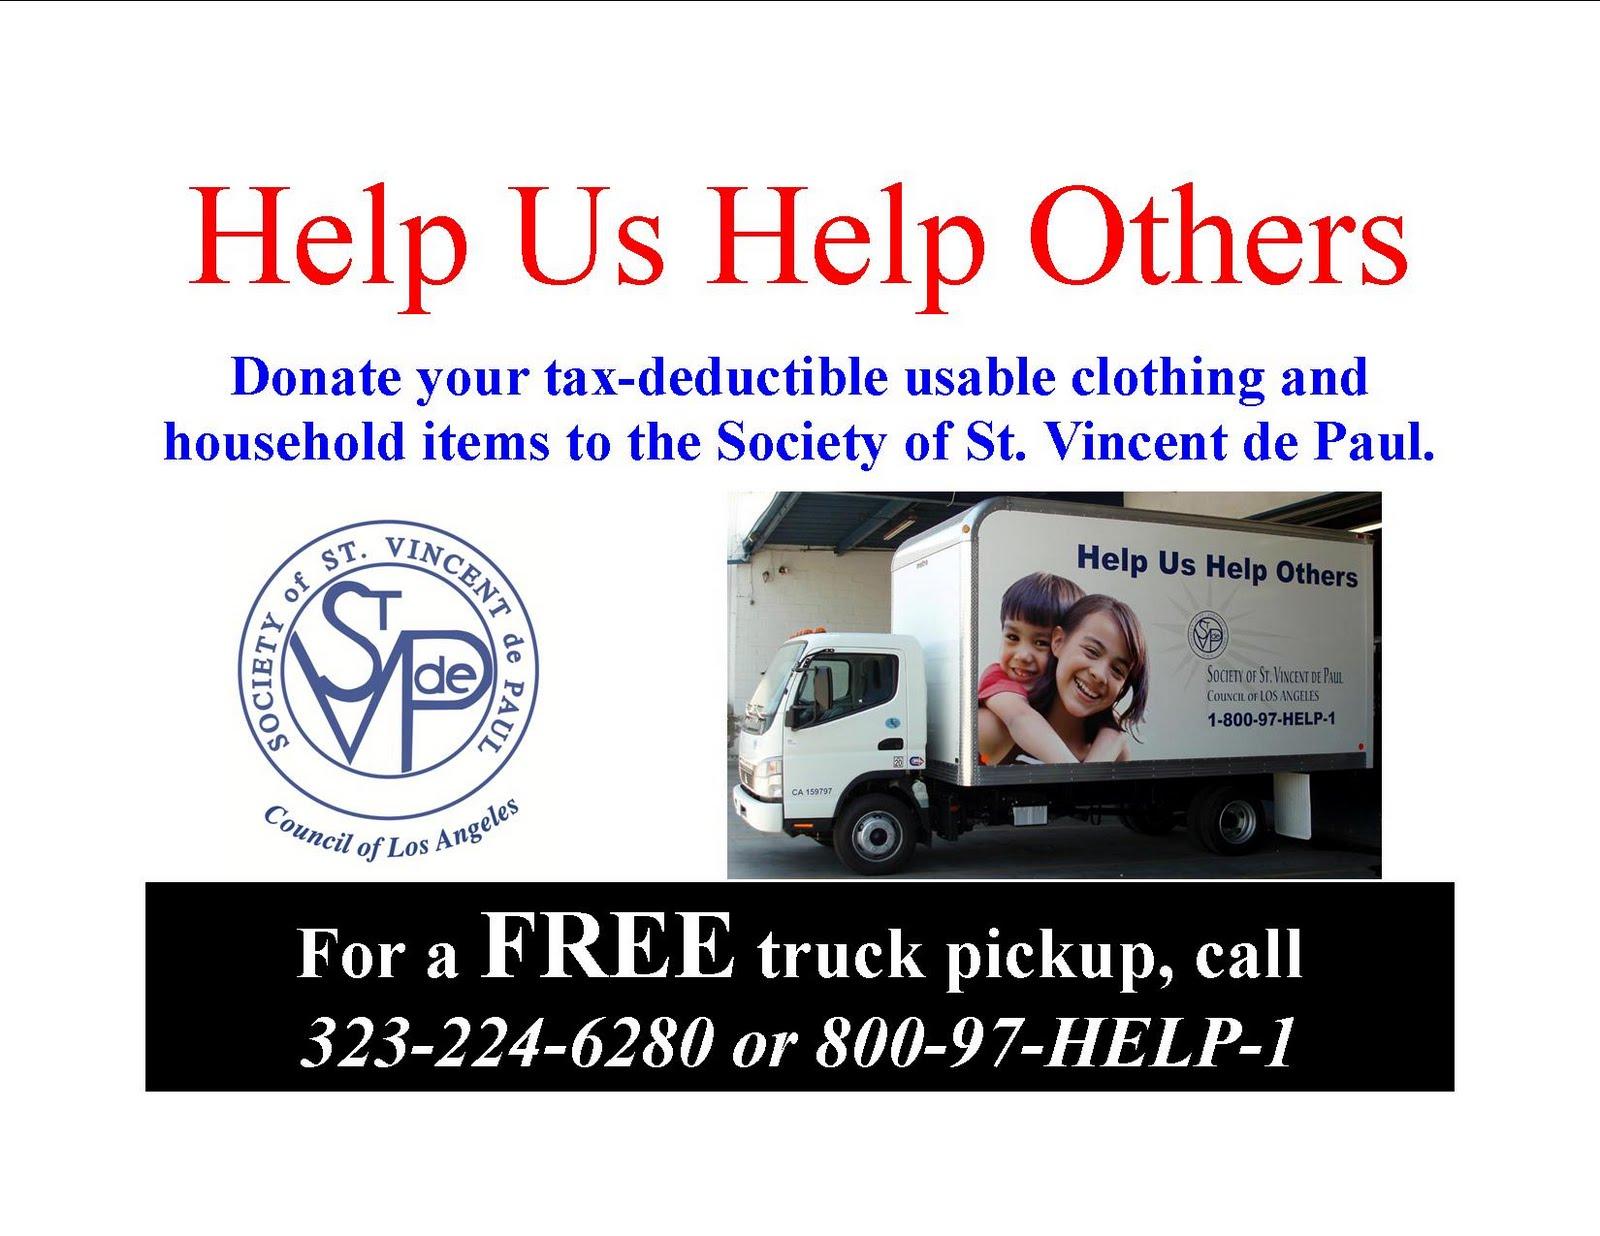 Free Furniture Pickup For Donation St. Vincent de Paul of Los Angeles: October 2011